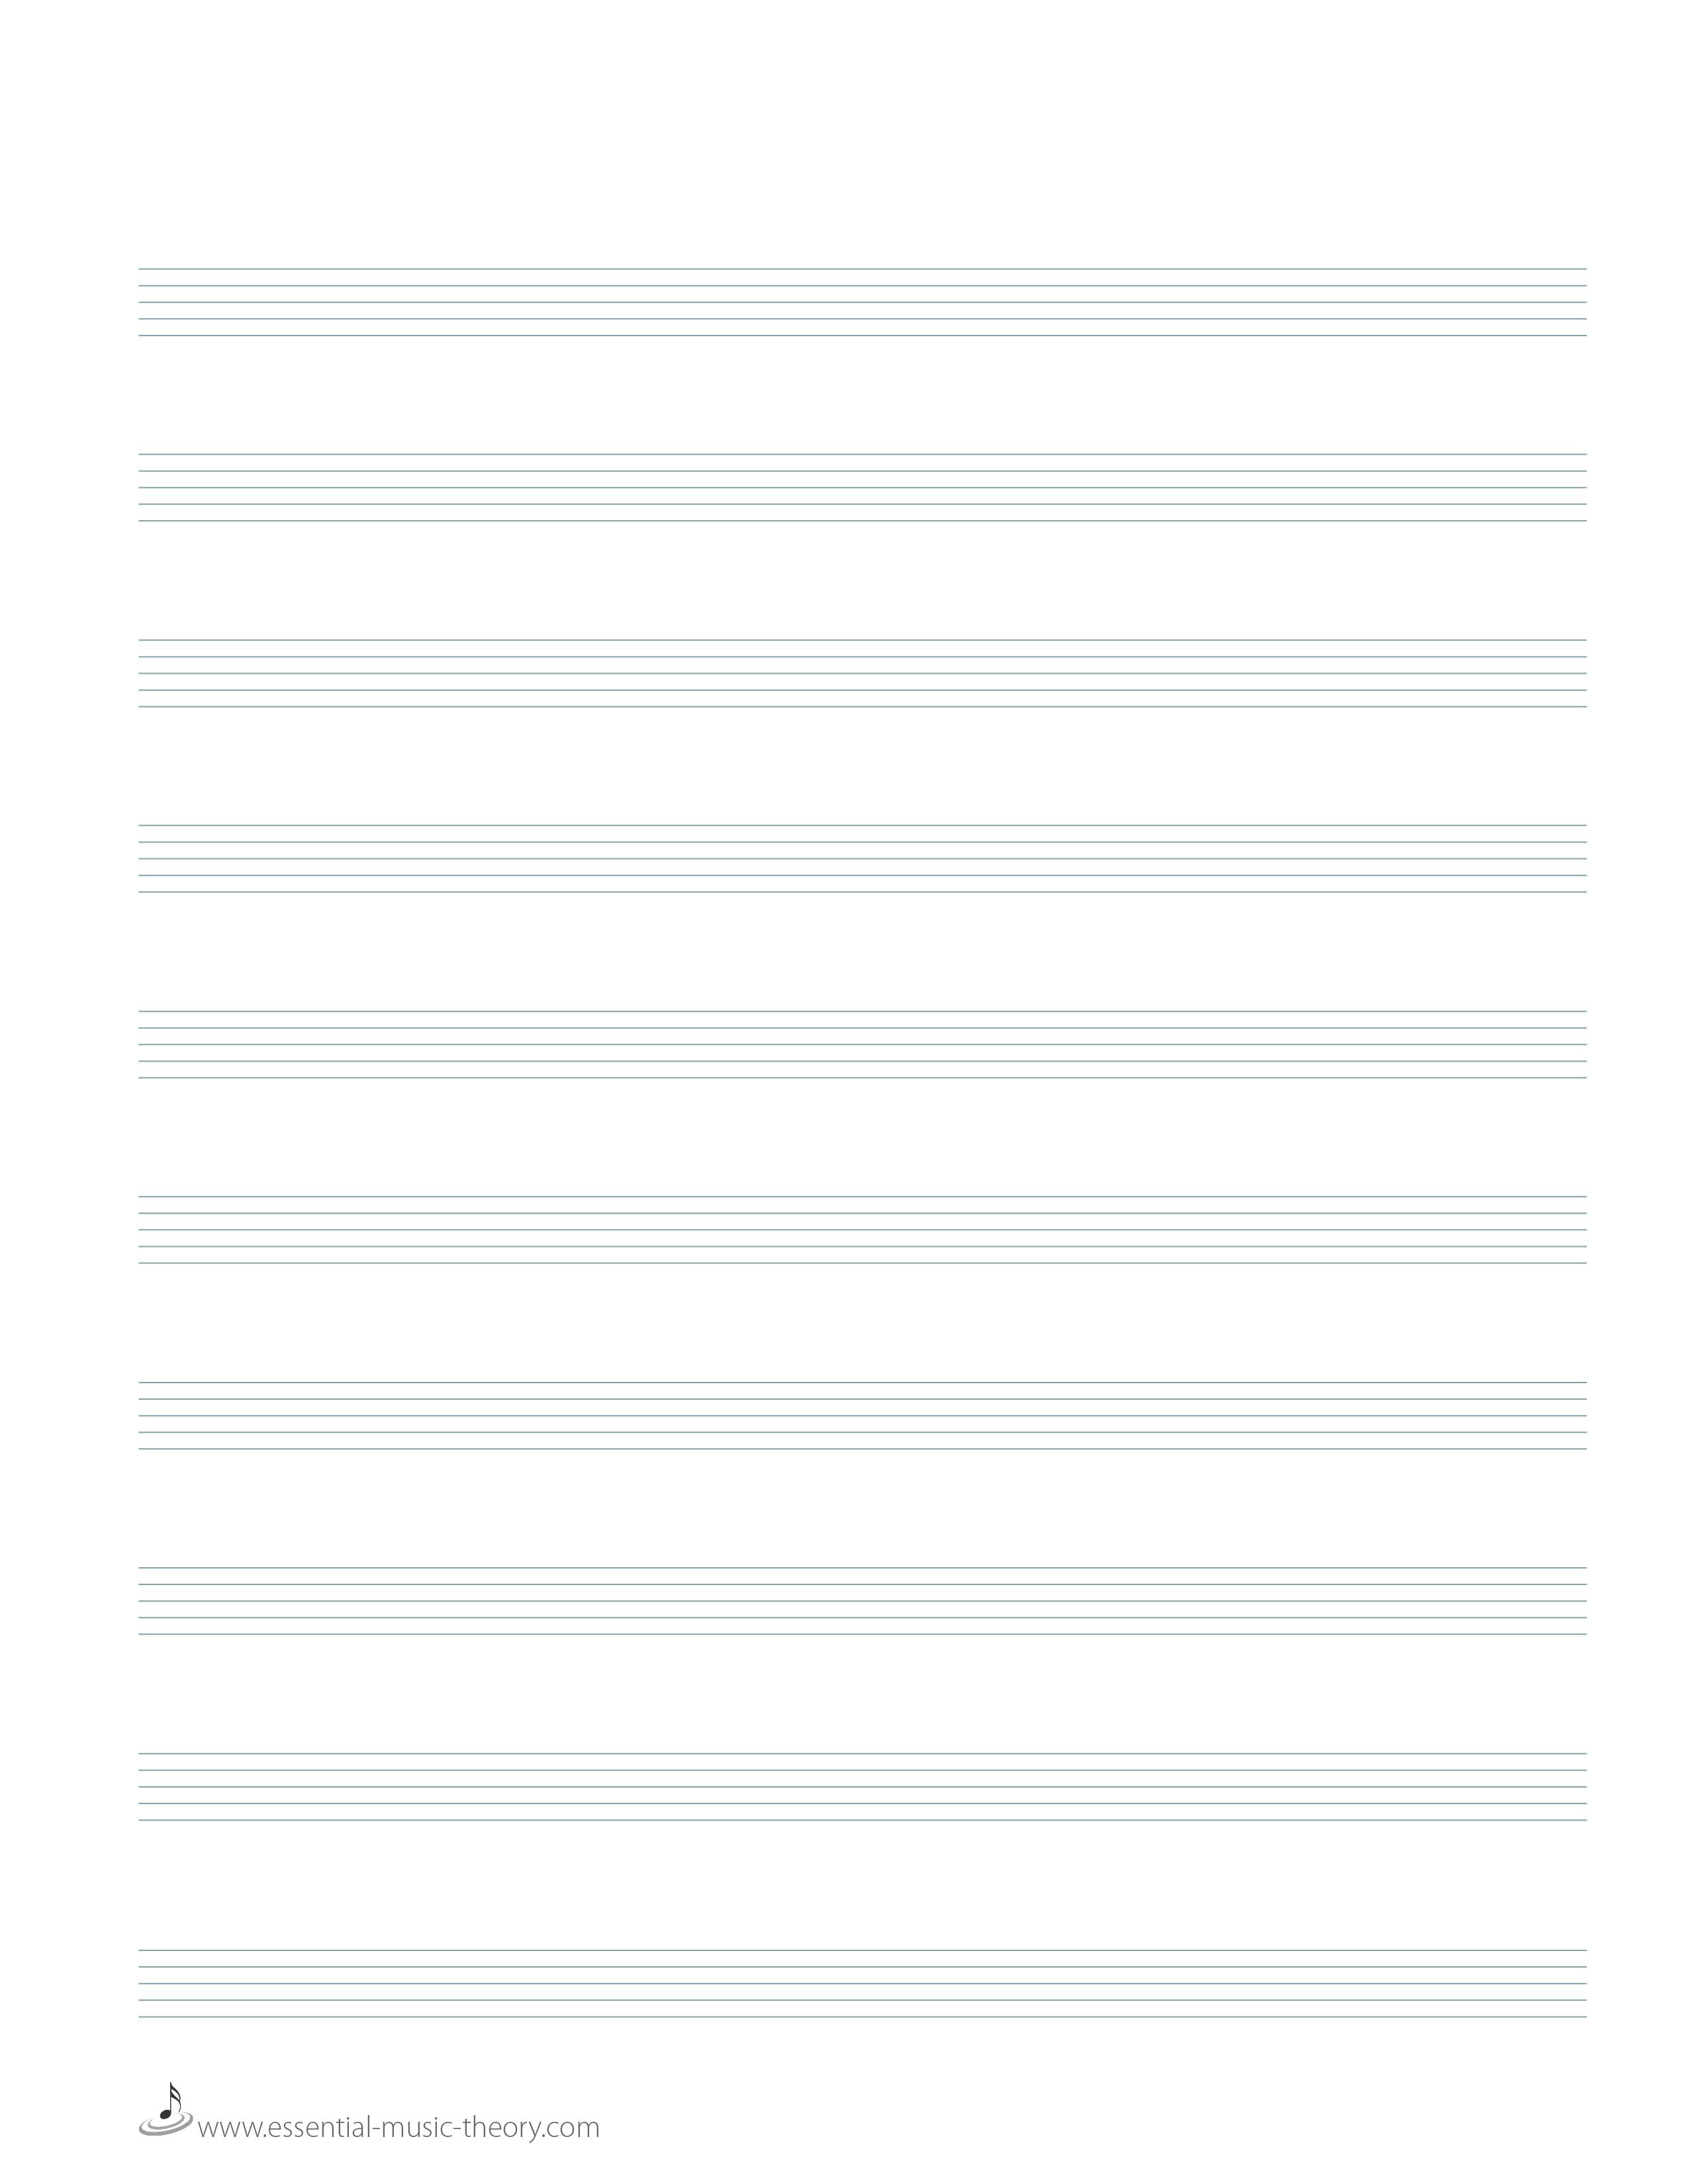 Blank Manuscript Paper - Free Printable Music Staff